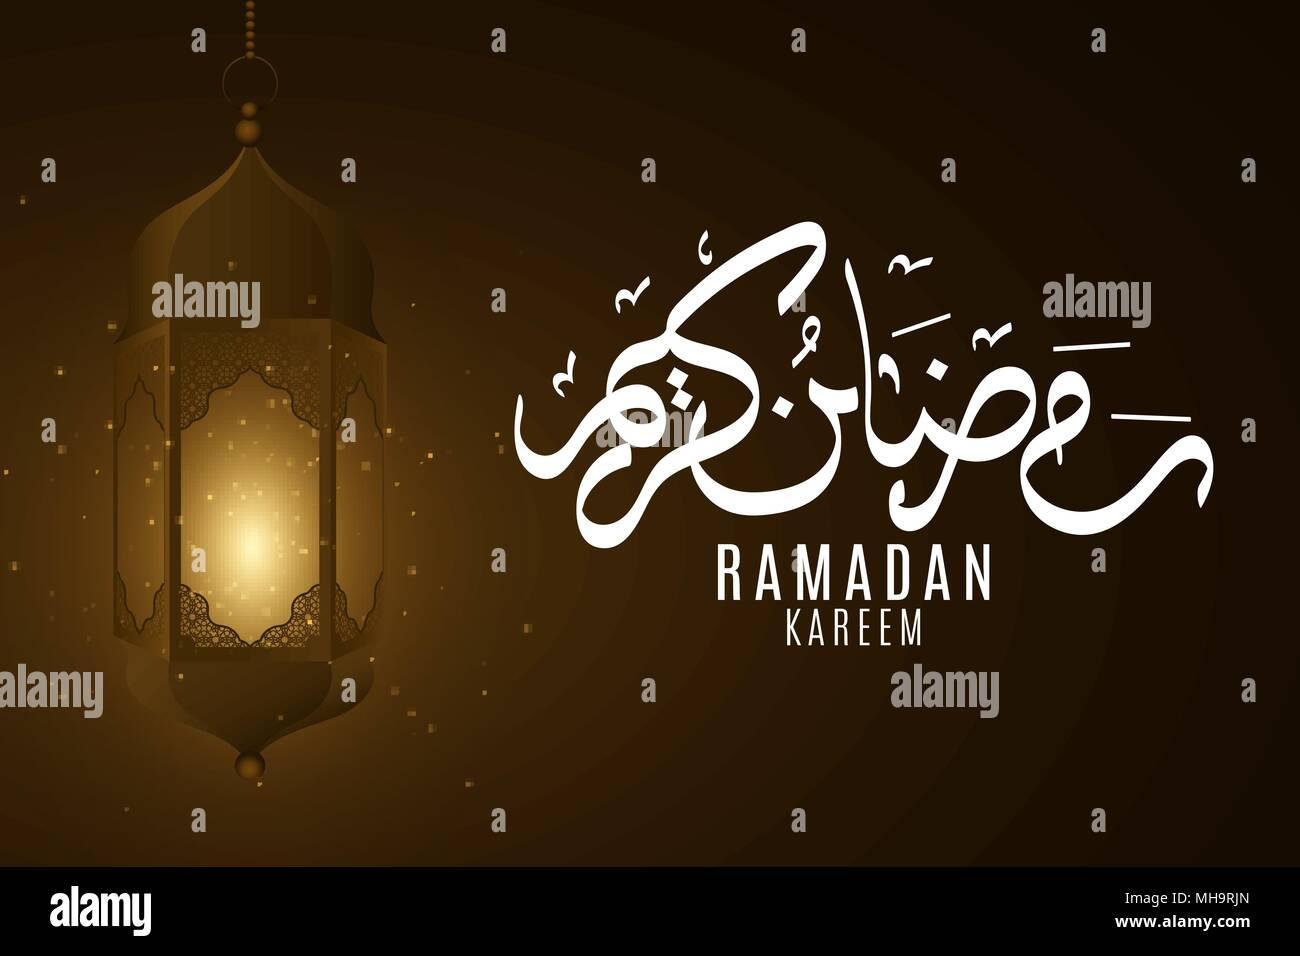 Greeting Card For Ramadan Kareem Decorative Lanterns Glow In The